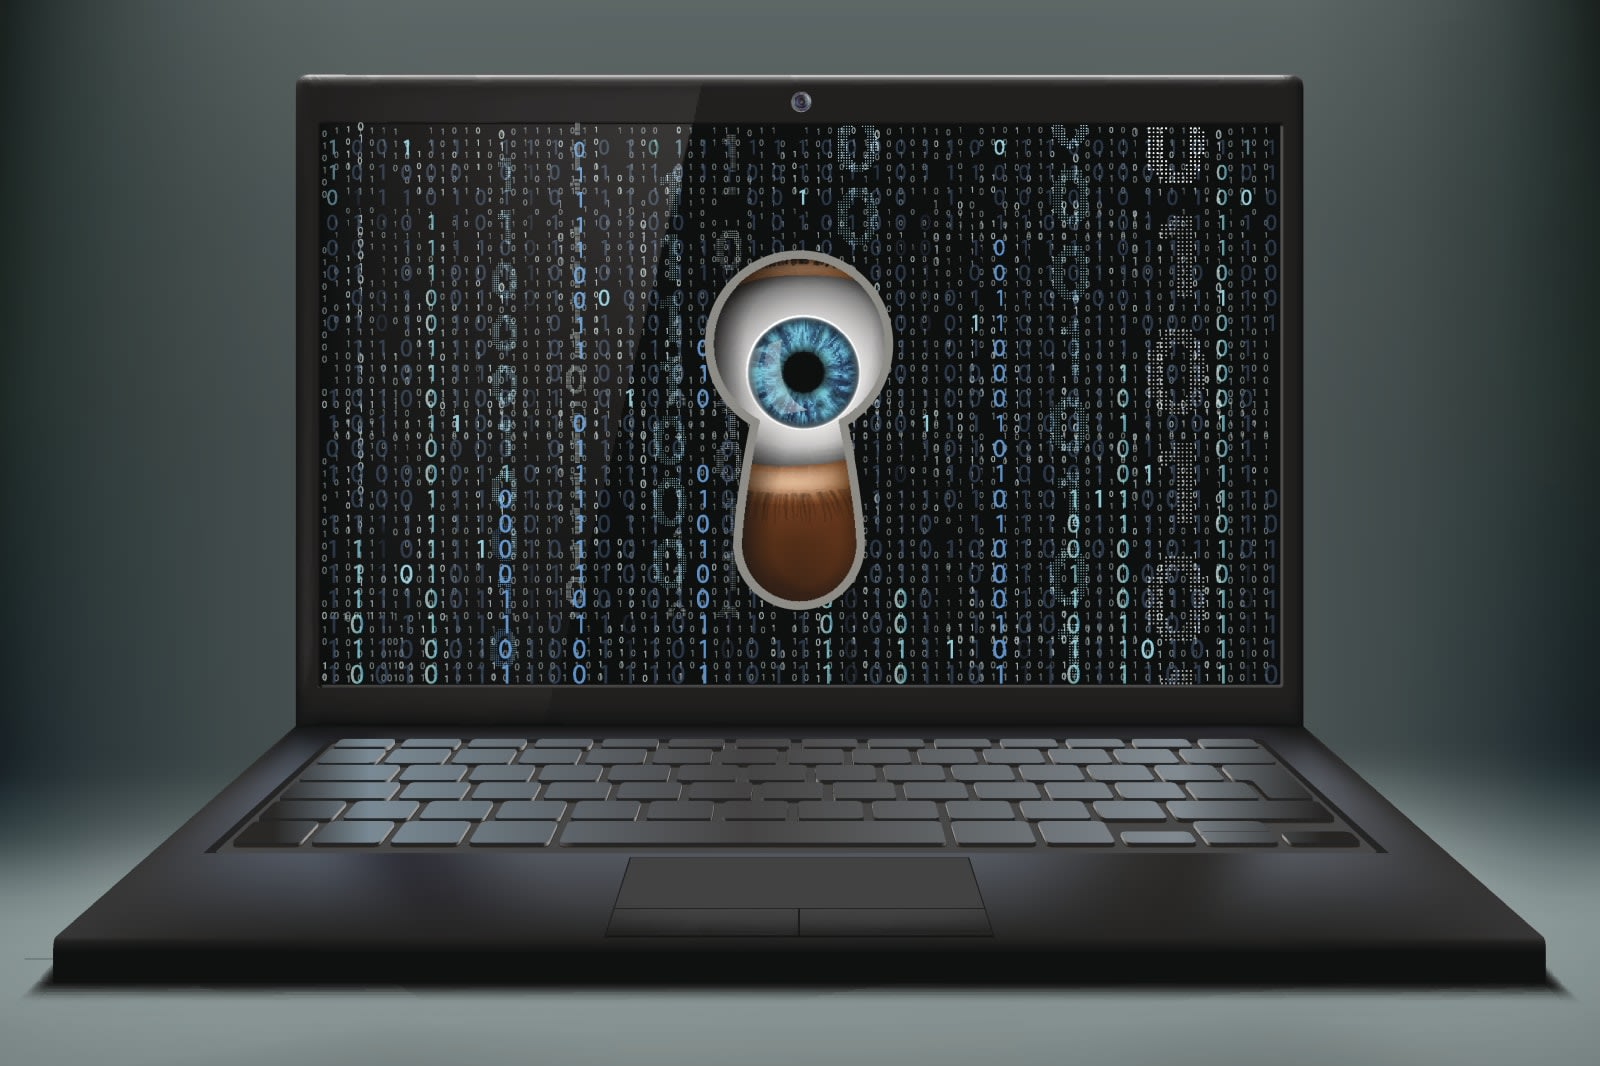 Porn cam network leaked sensitive data for thousands of models